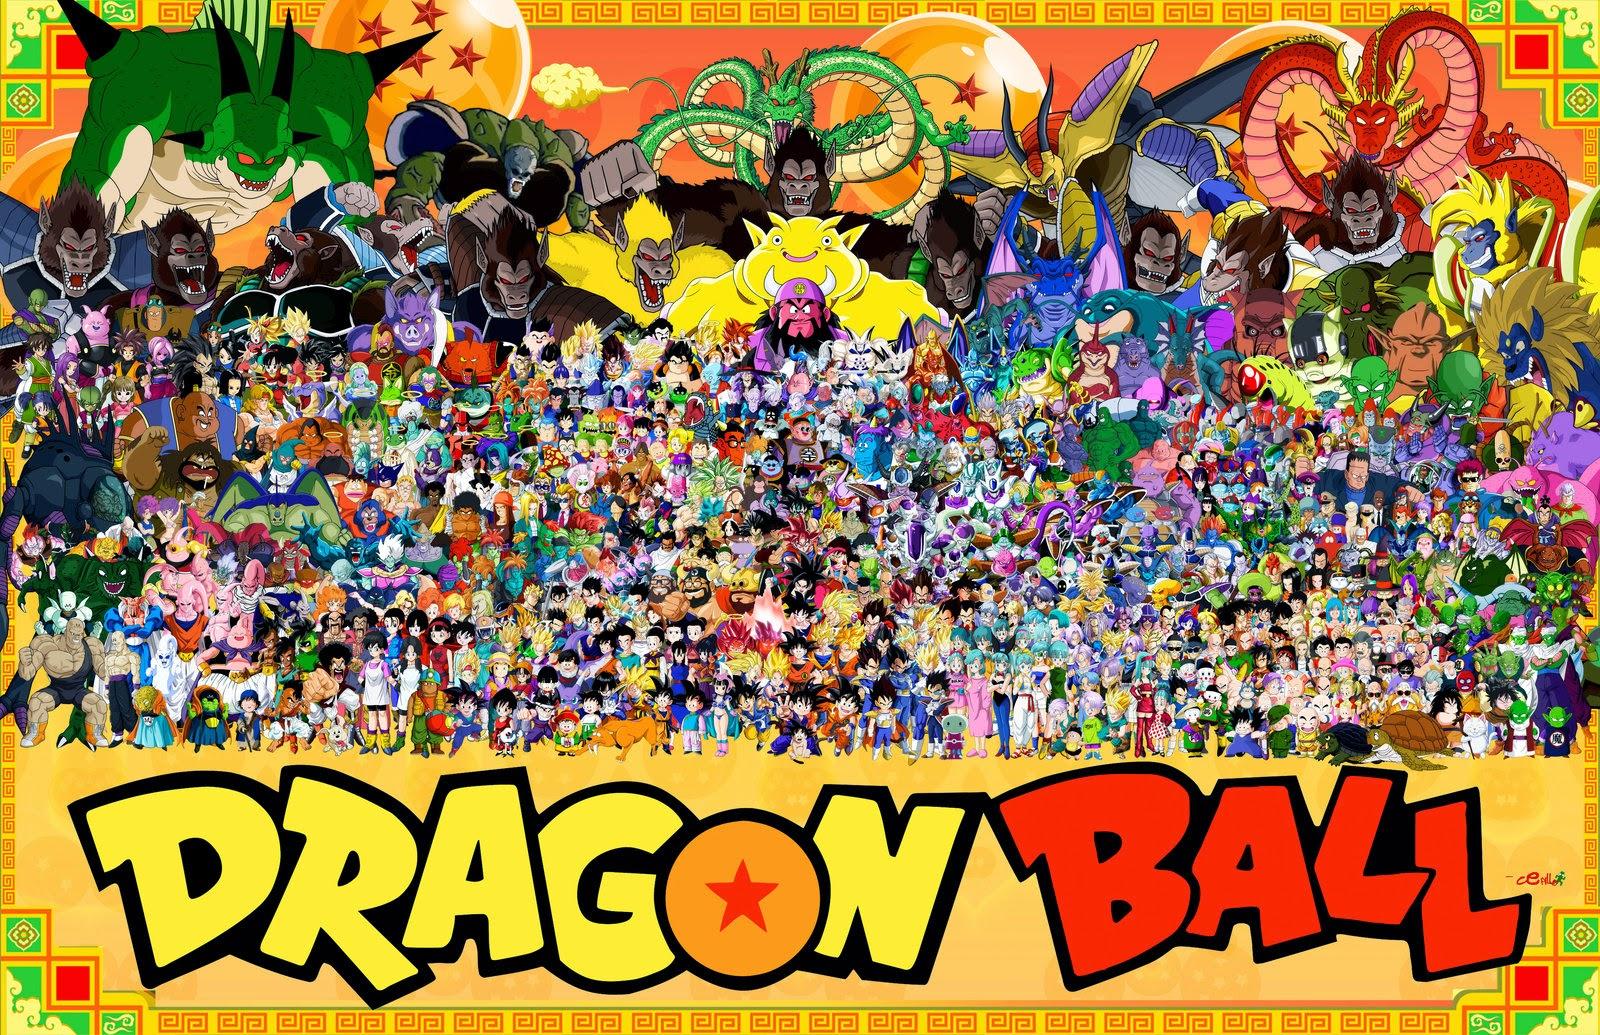 Dragon Ball Z Wallpaper All Characters 157